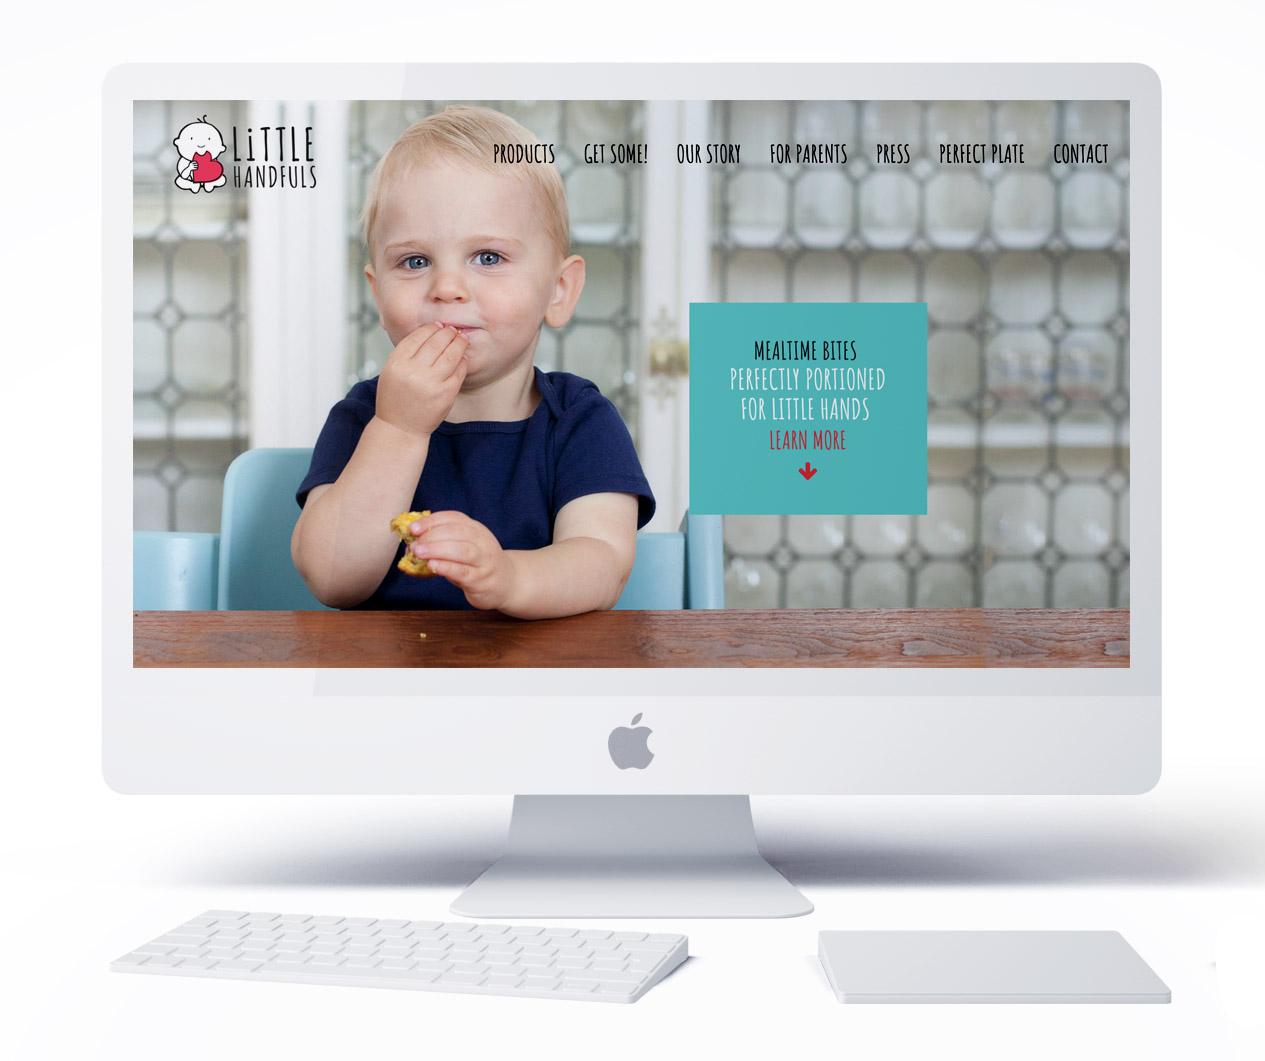 Little Handfuls Organic website design